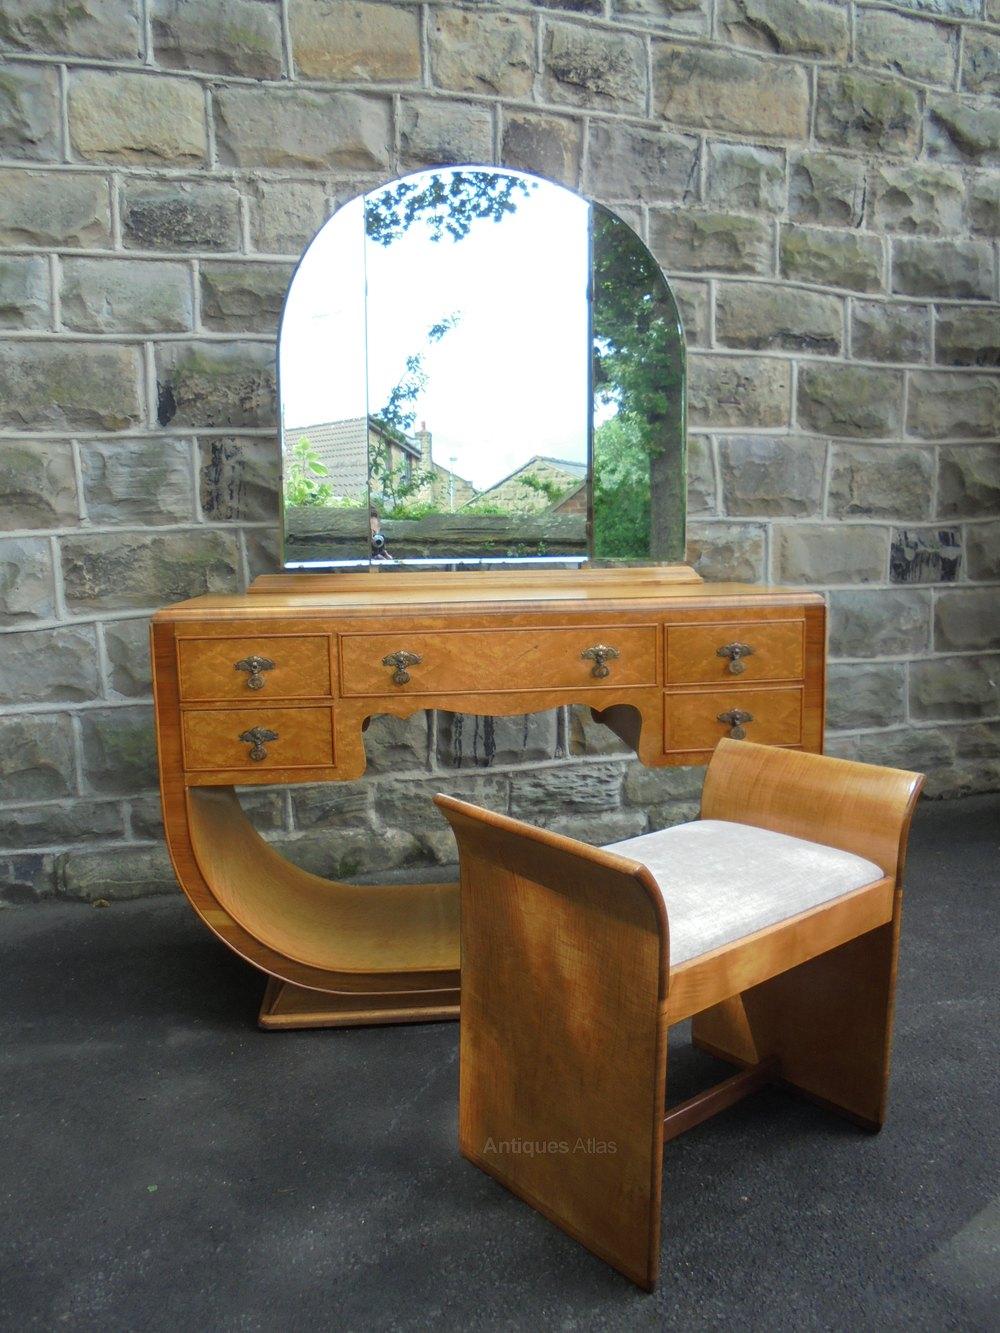 Dating antique furniture veneer 8